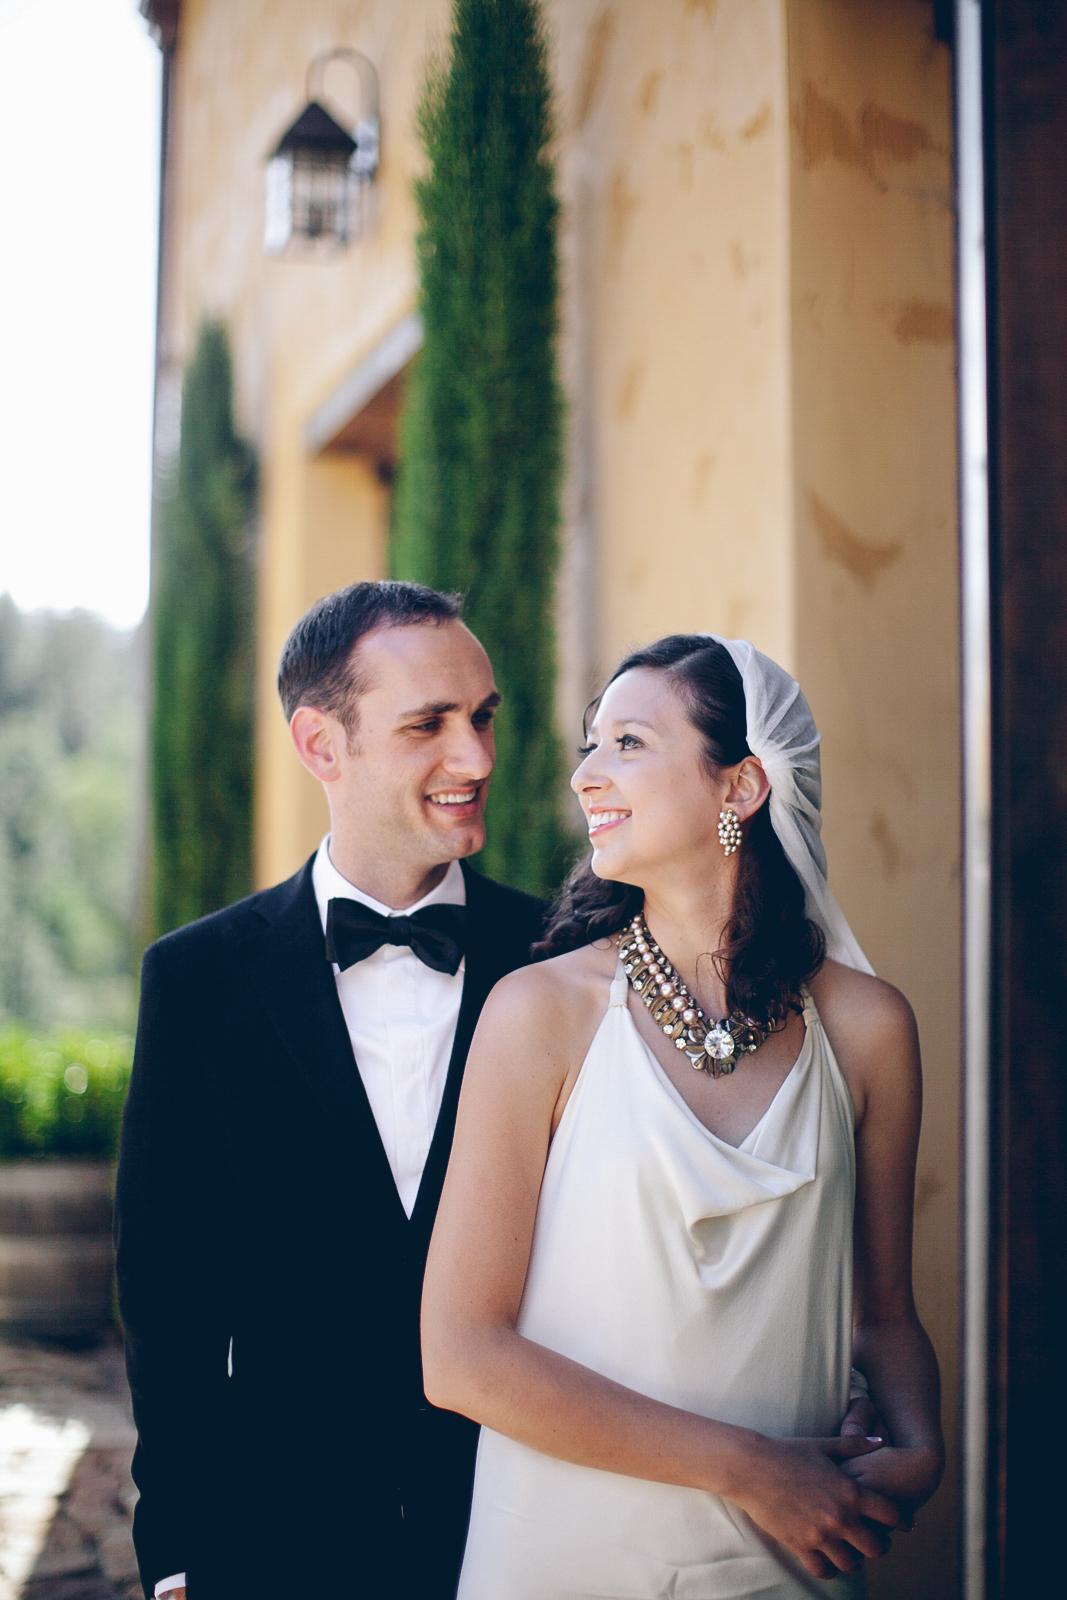 miraflores_winery_wedding_photography_ian_melissa_ebony_siovhan_bokeh_photography_13.jpg